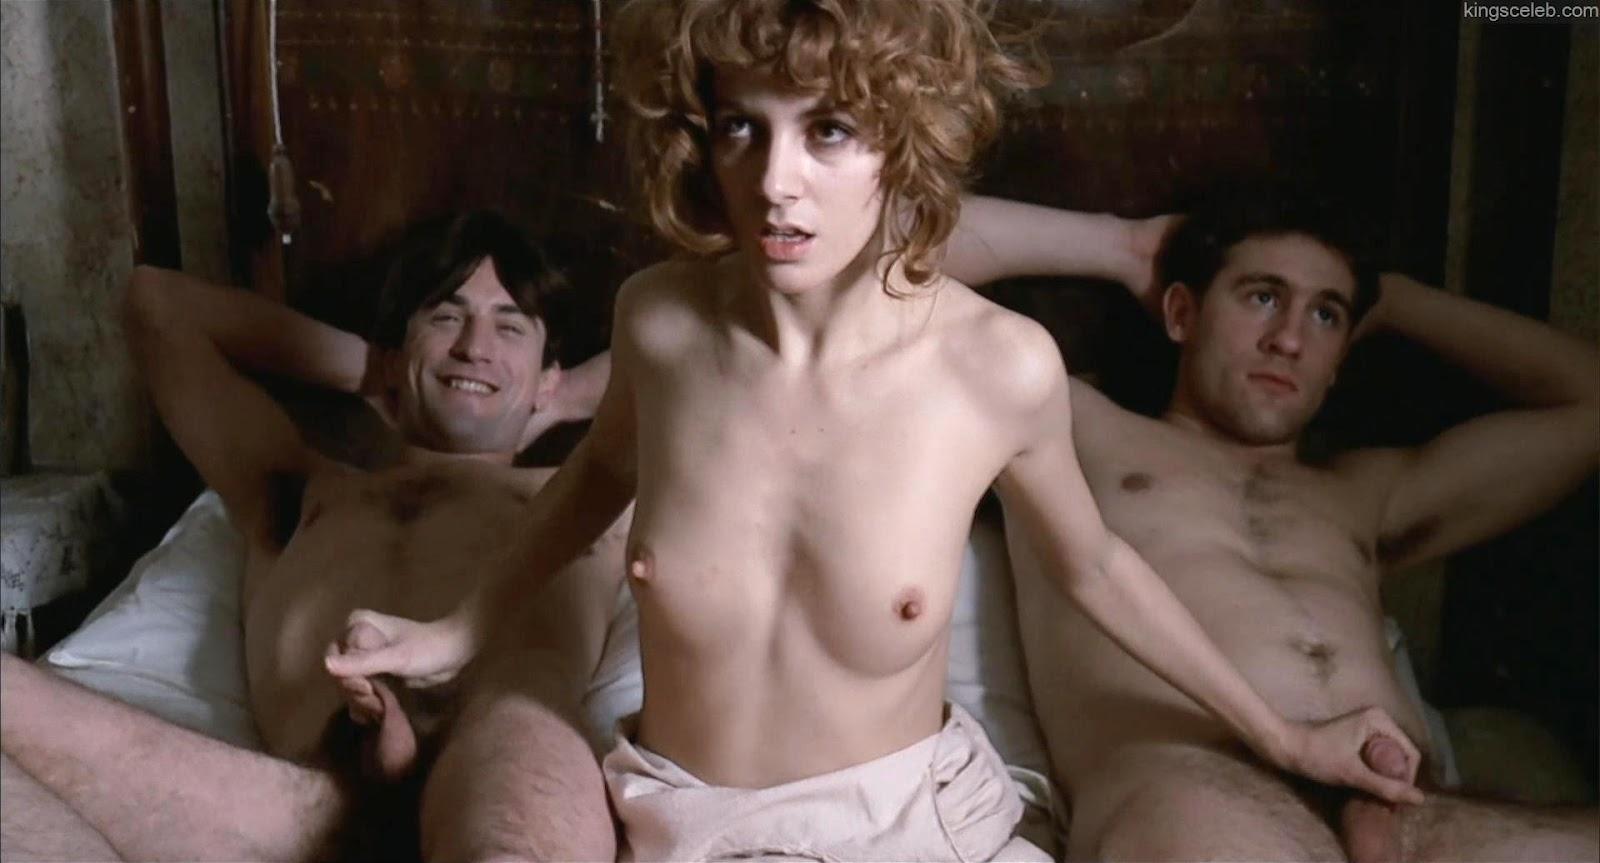 British Naked And Afraid